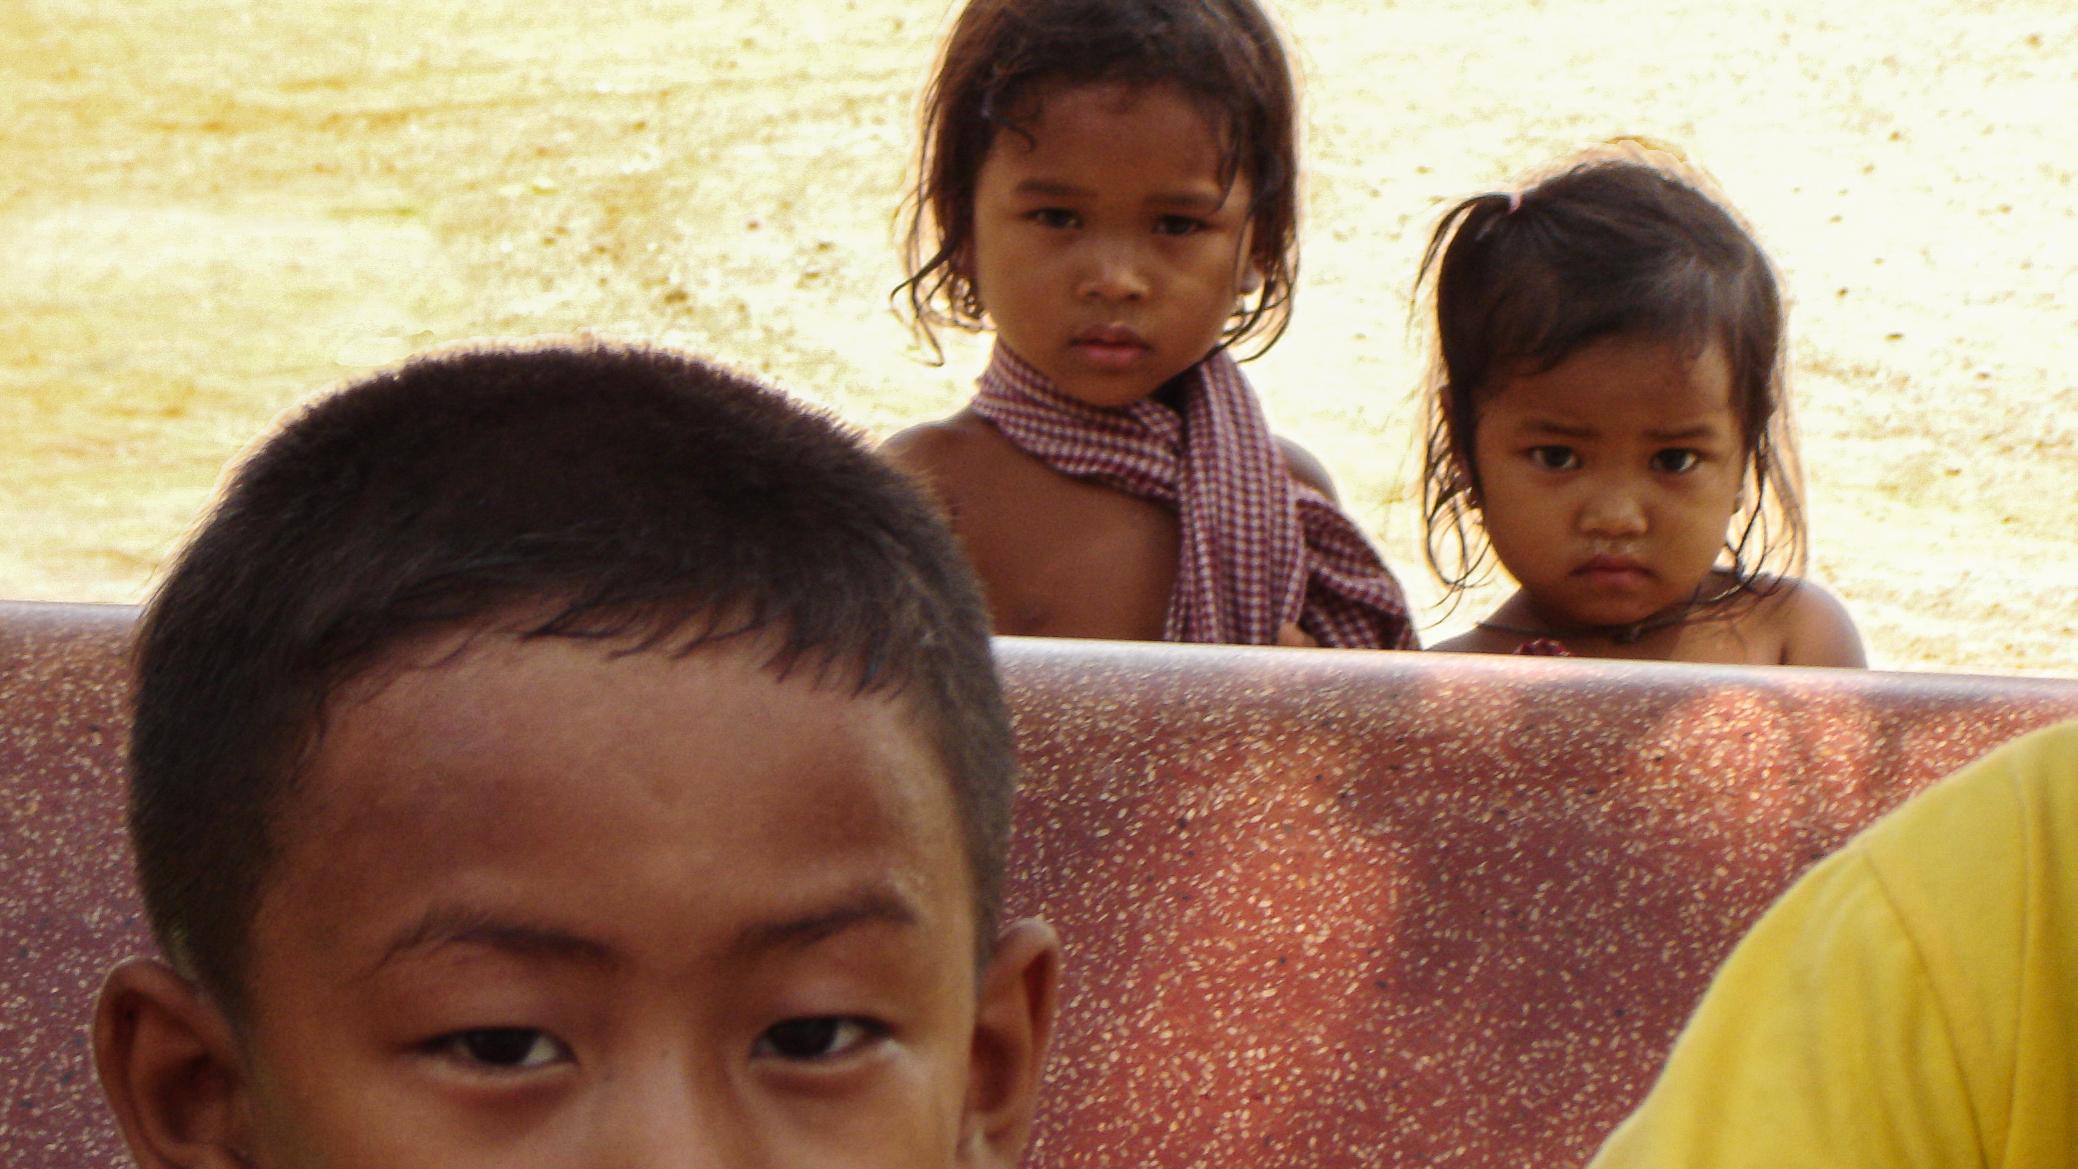 A trip to Cambodia